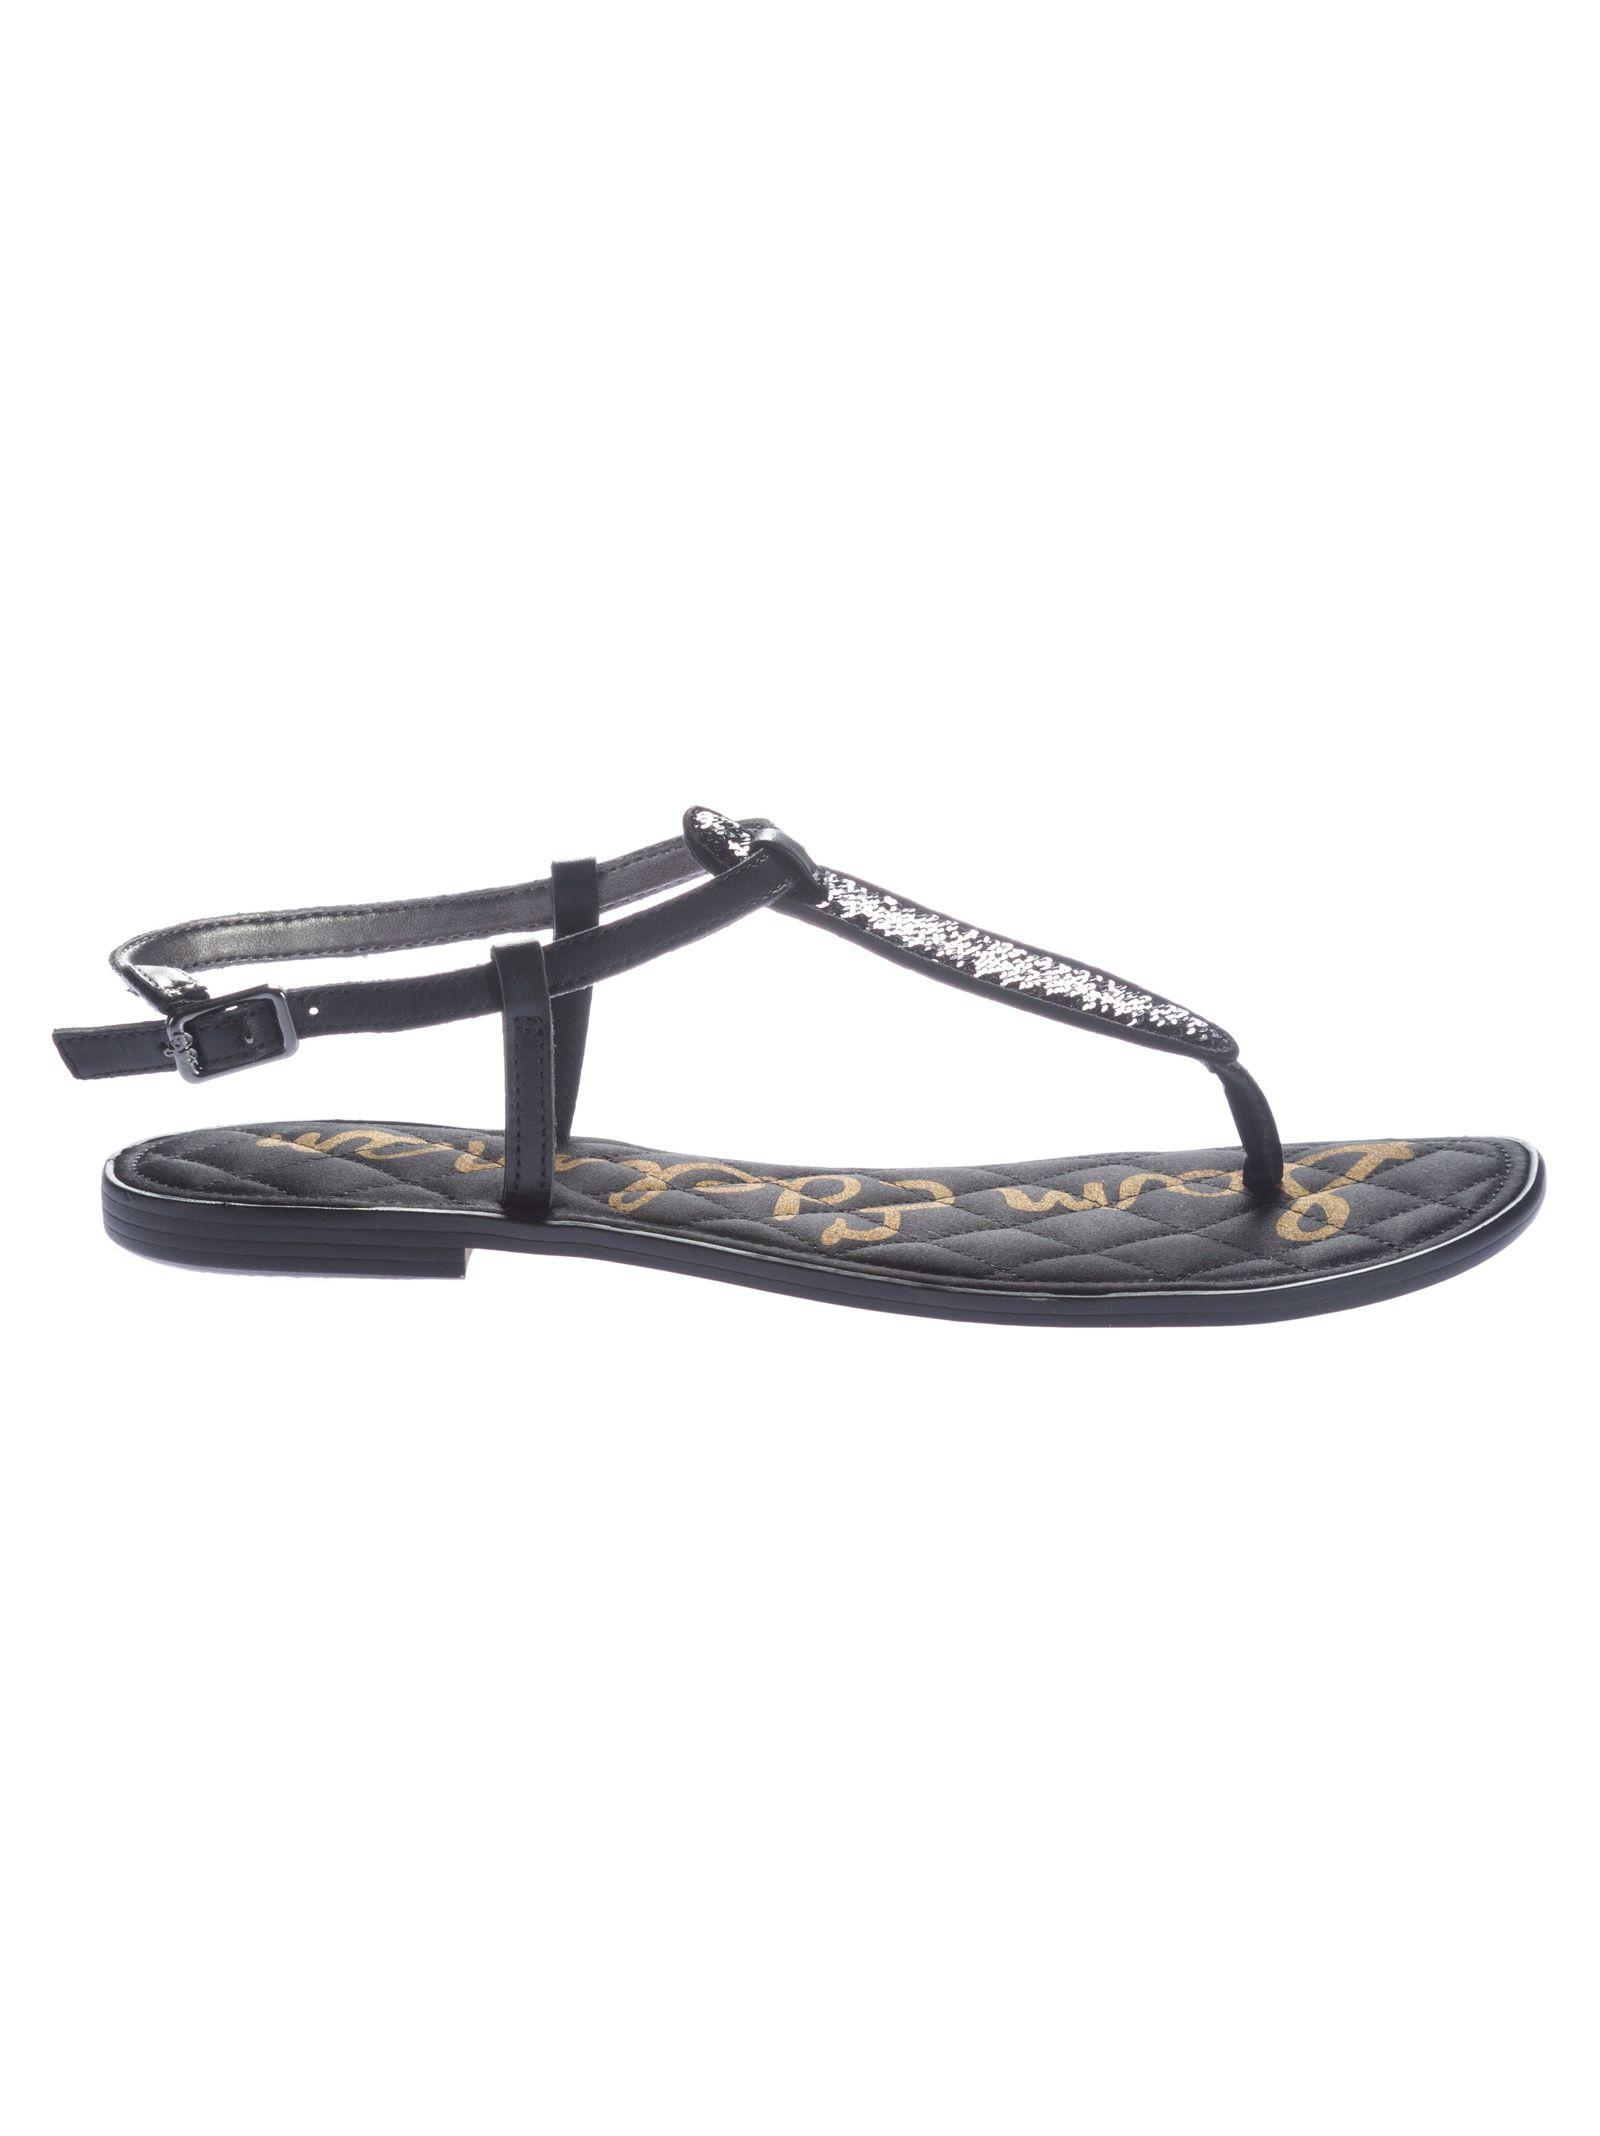 813dceab1 Sam Edelman Sam Edelman Gigi Thong Flat Sandals - Black - 10578851 ...